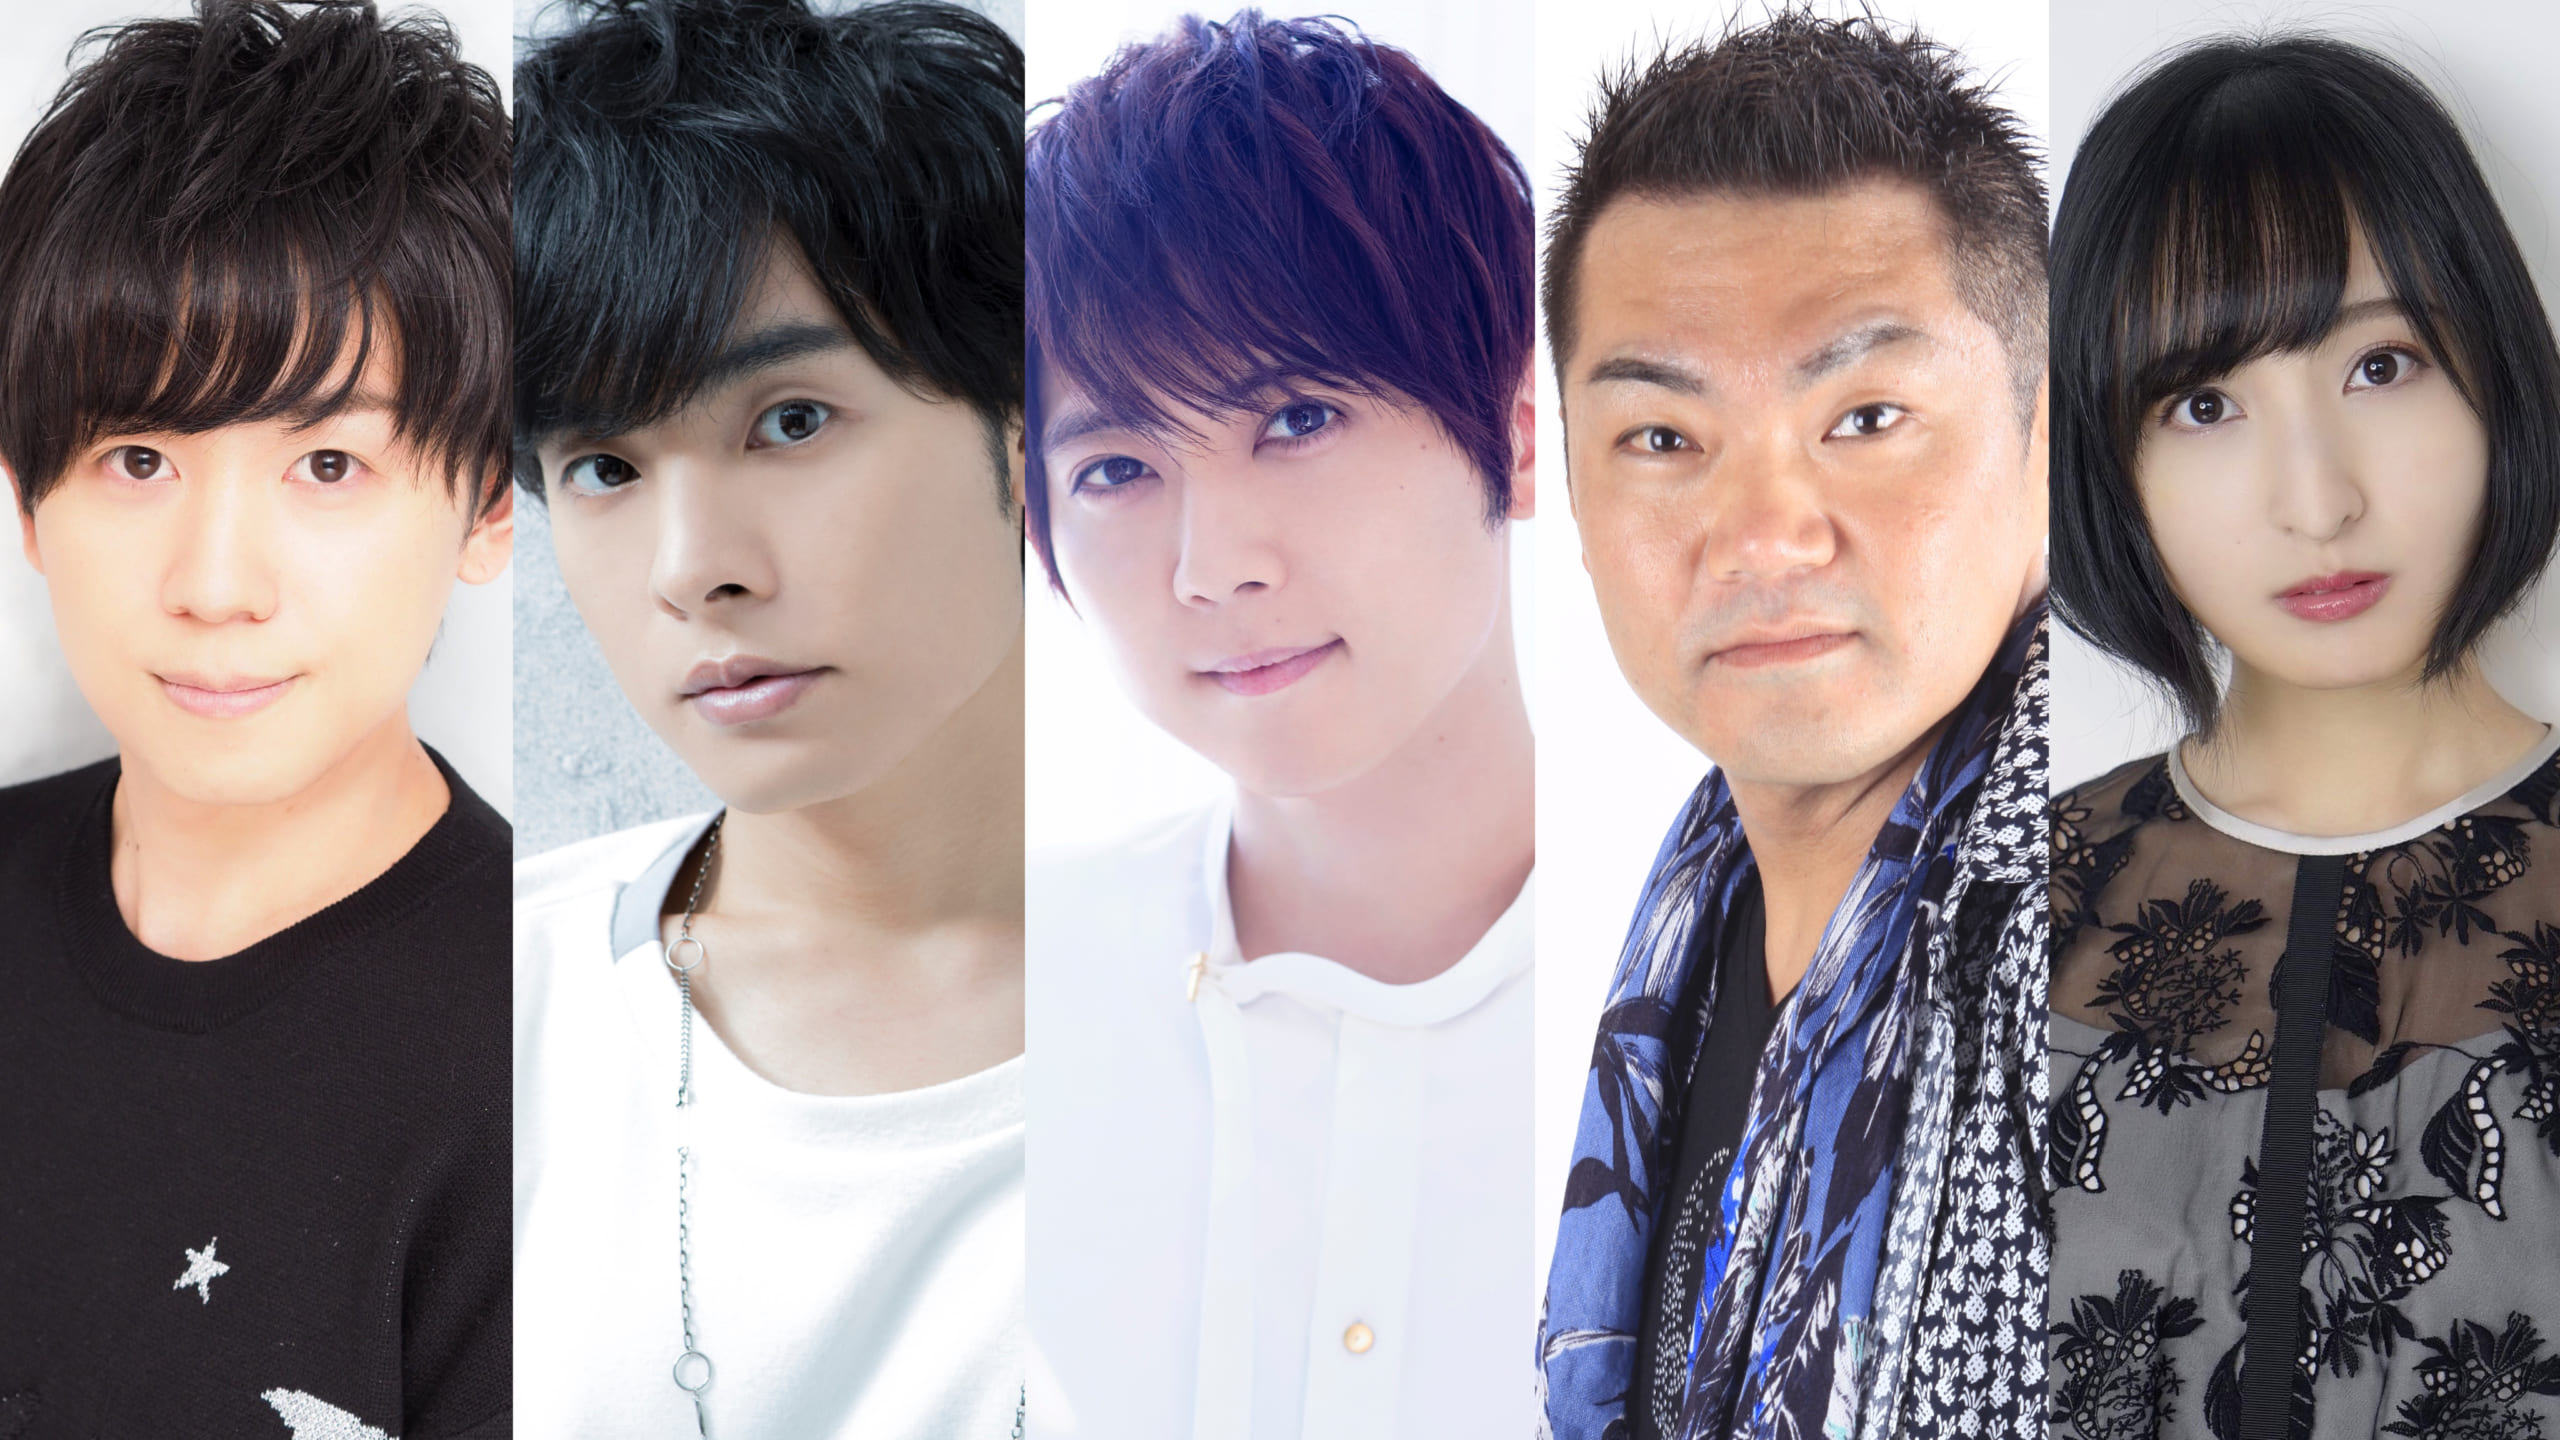 「ZIP!×ヒロアカ」声優ウィークで山下大輝さん、梶裕貴さんらがナレーター!